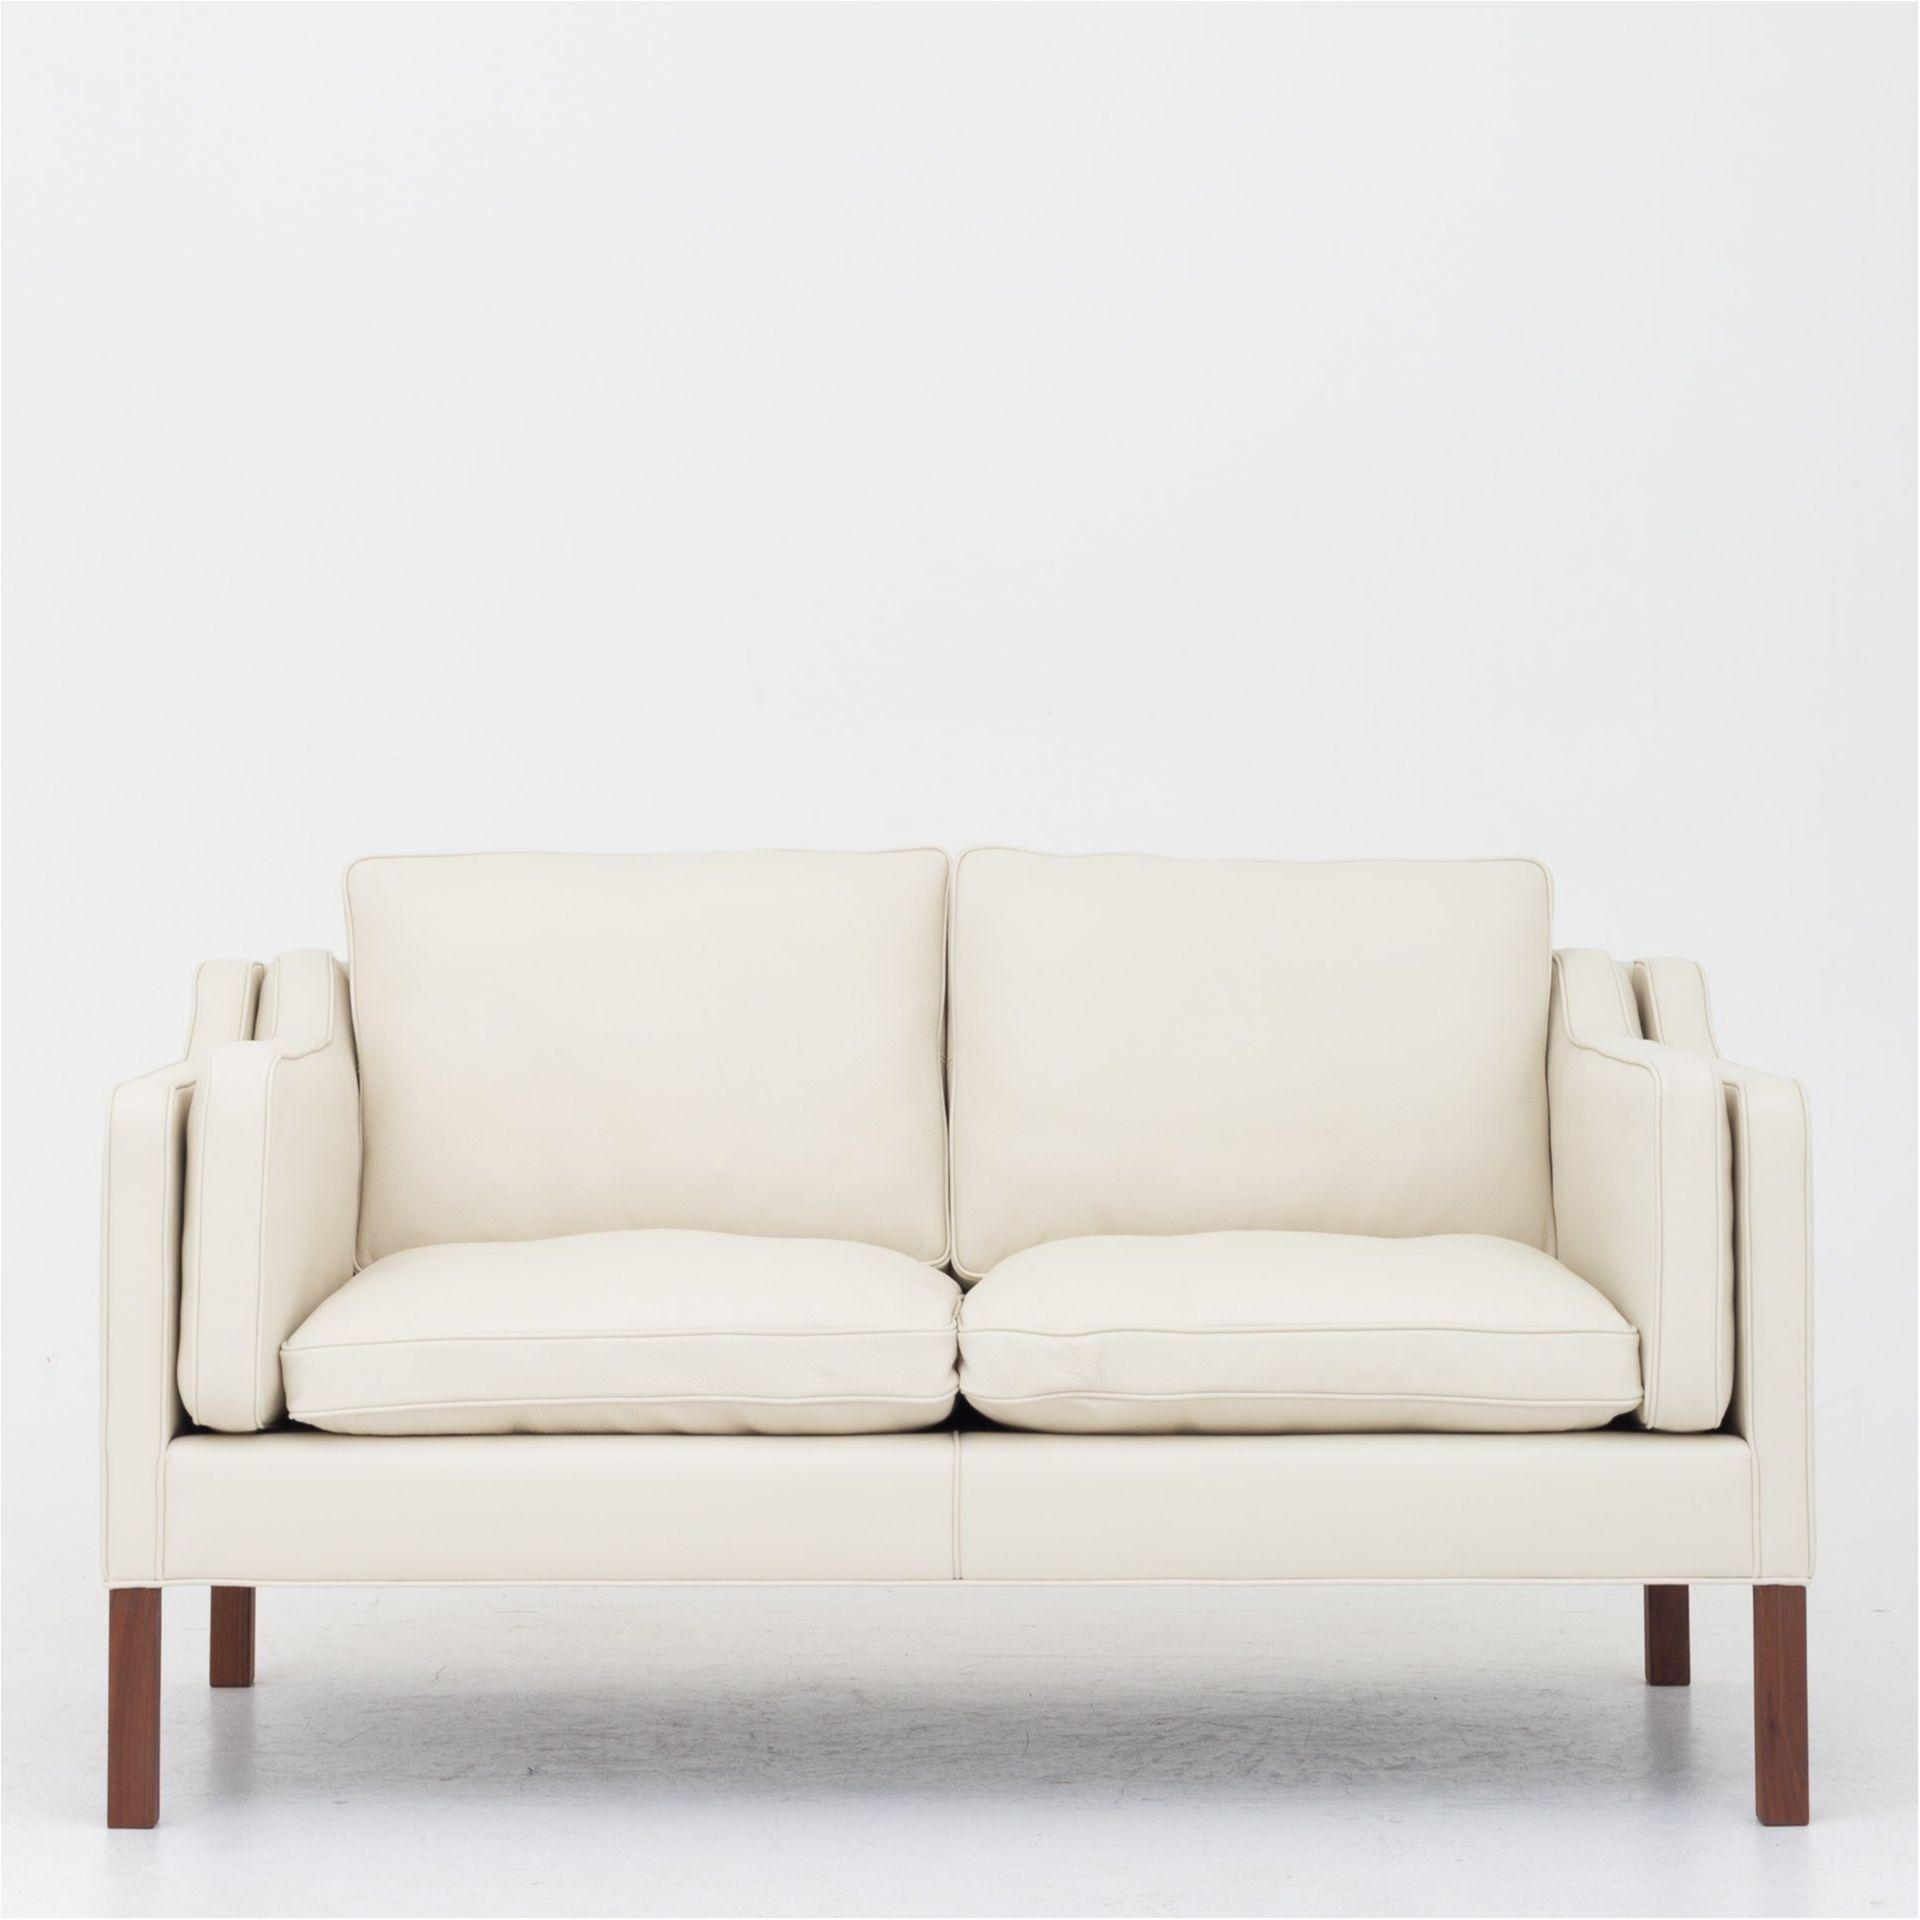 Bm 2212 Reupholstered Sofa